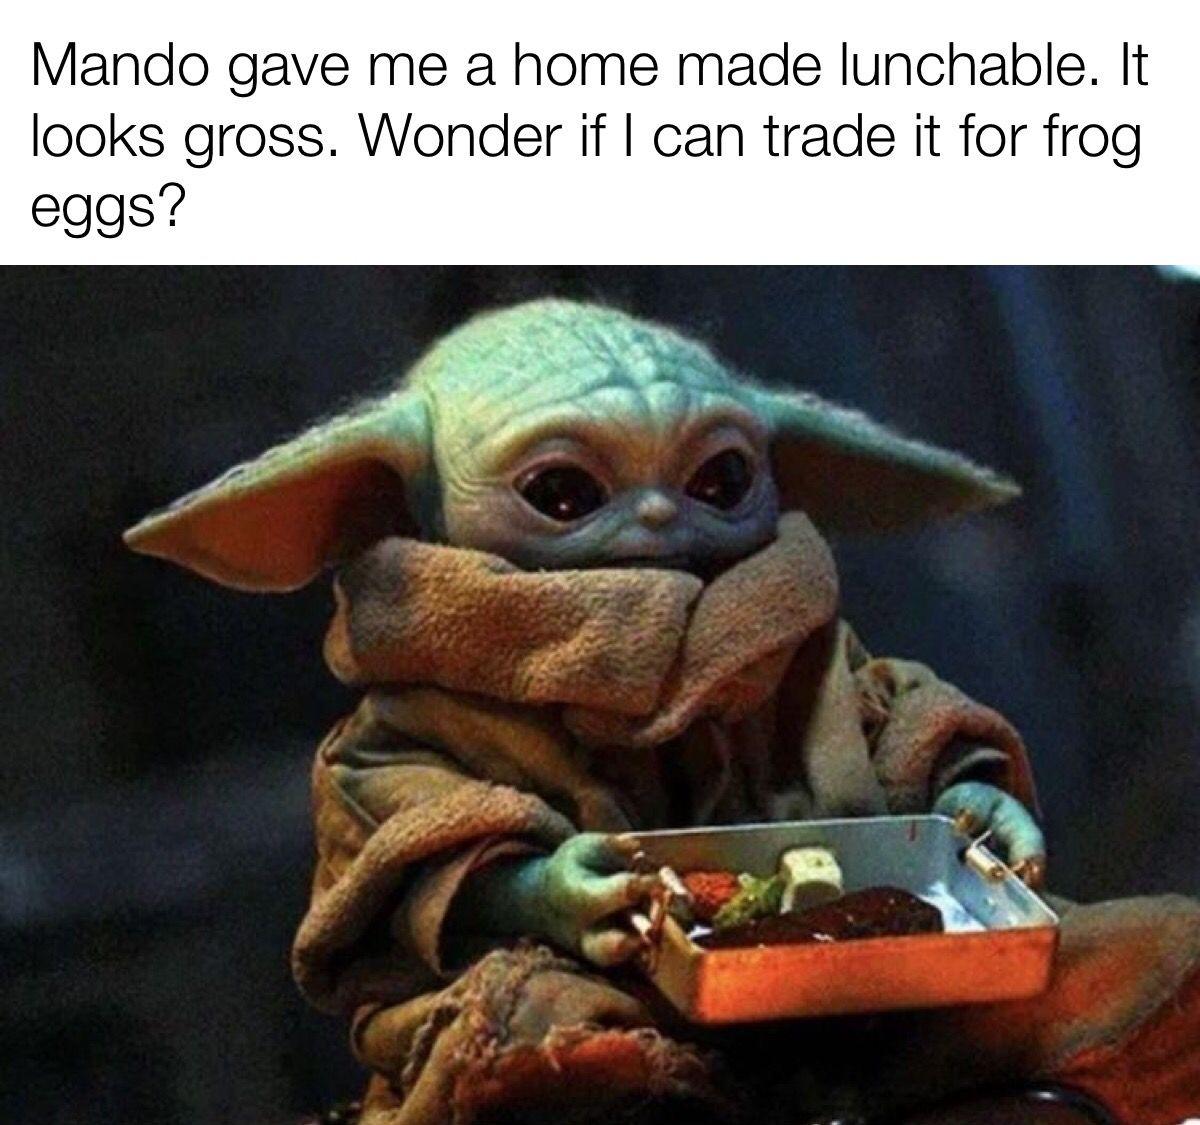 Pin By Penny Ronan On Baby Yoda Funny Star Wars Memes Yoda Funny Star Wars Jokes